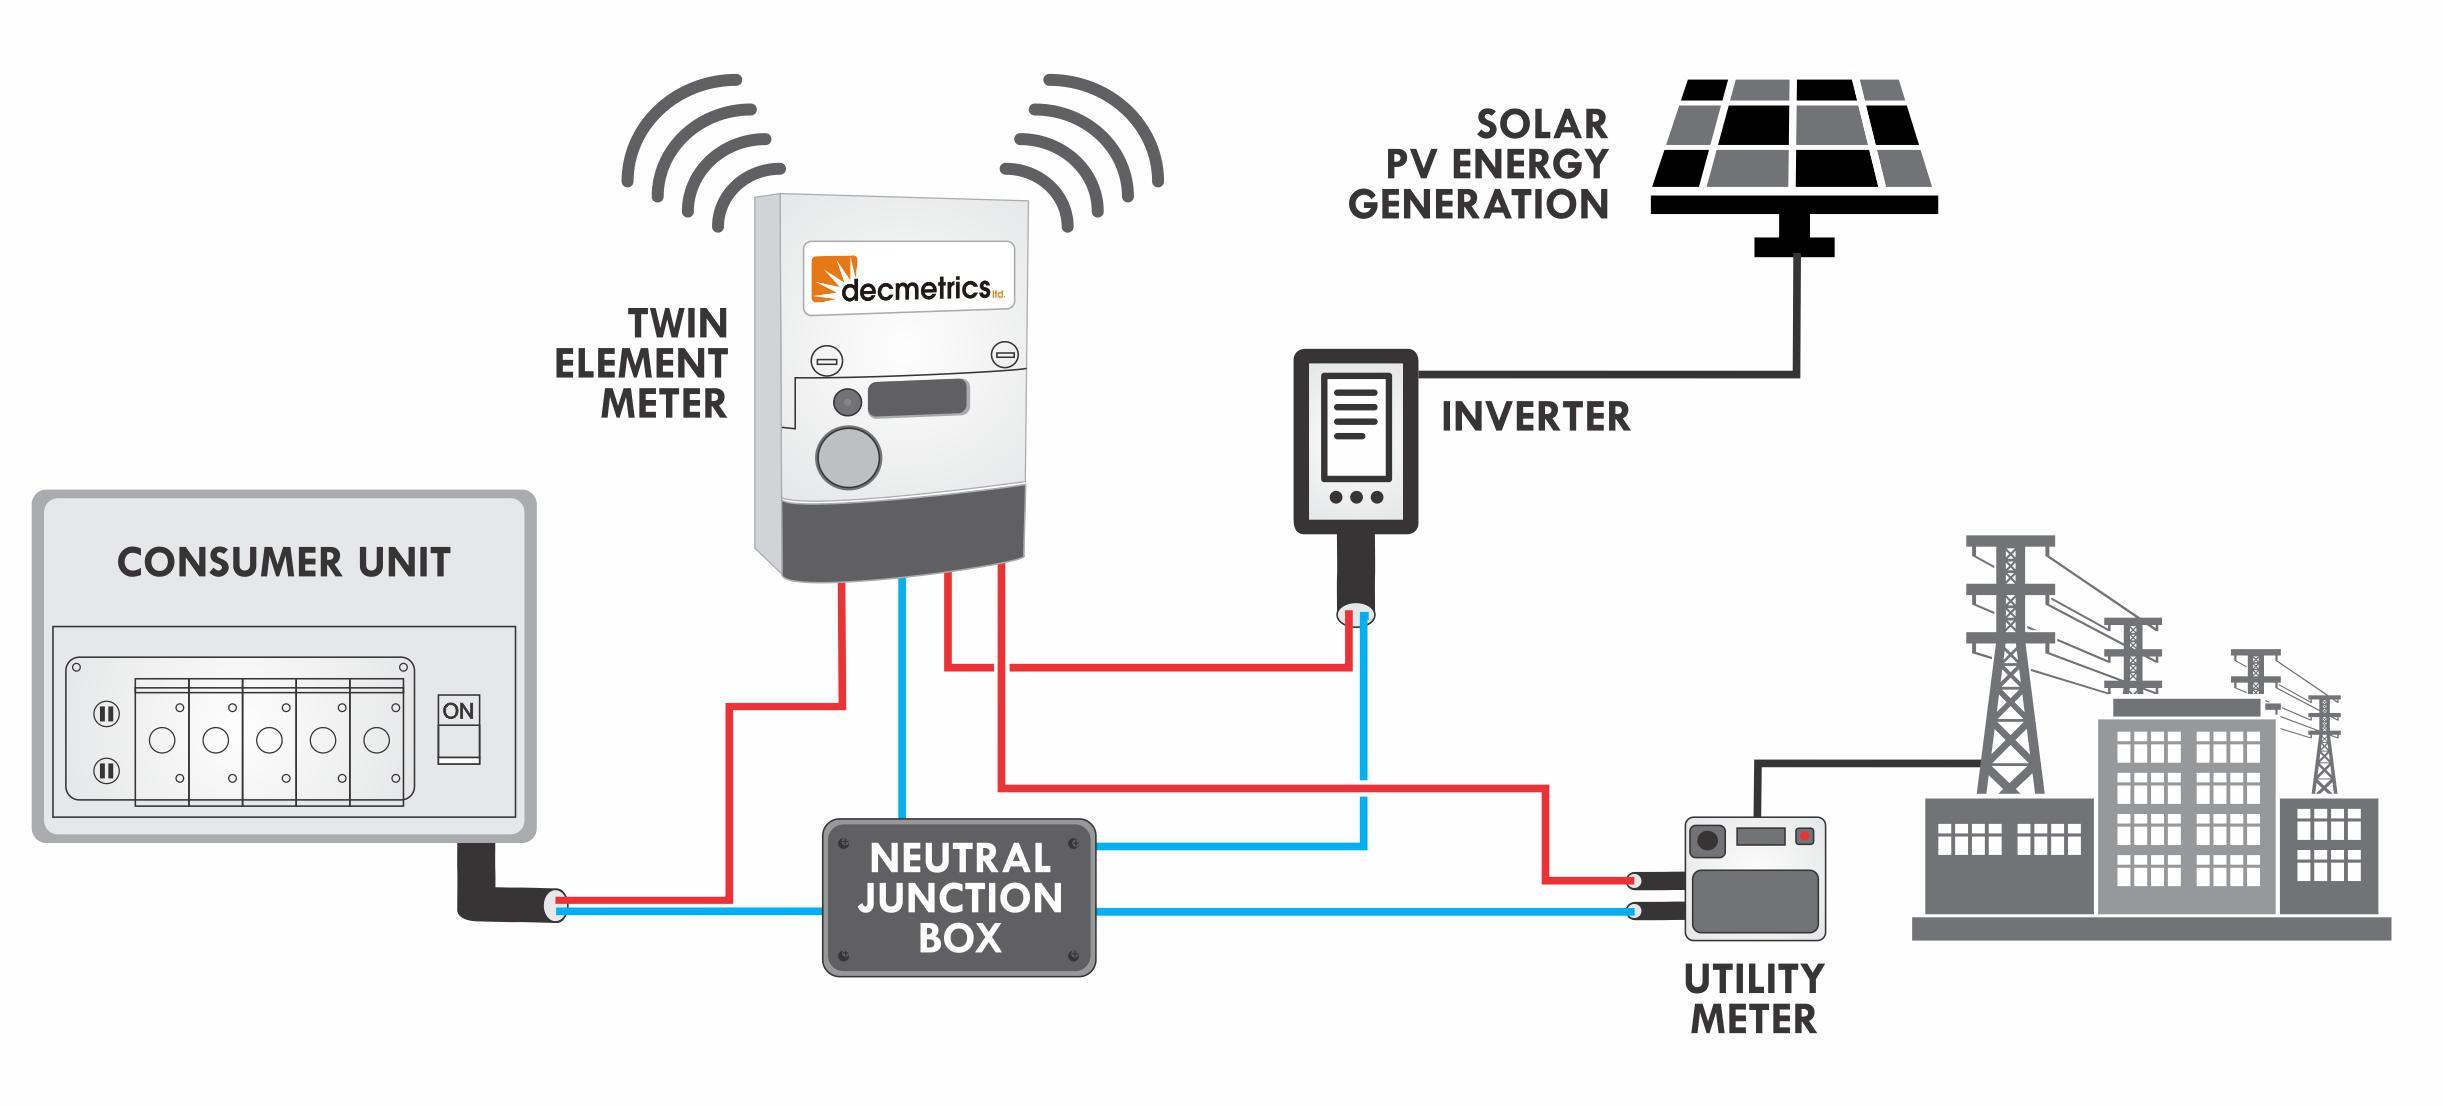 medium resolution of net metering wiring diagram wiring diagrams favoritessolar pv solar pv net metering schematic diagram solar net